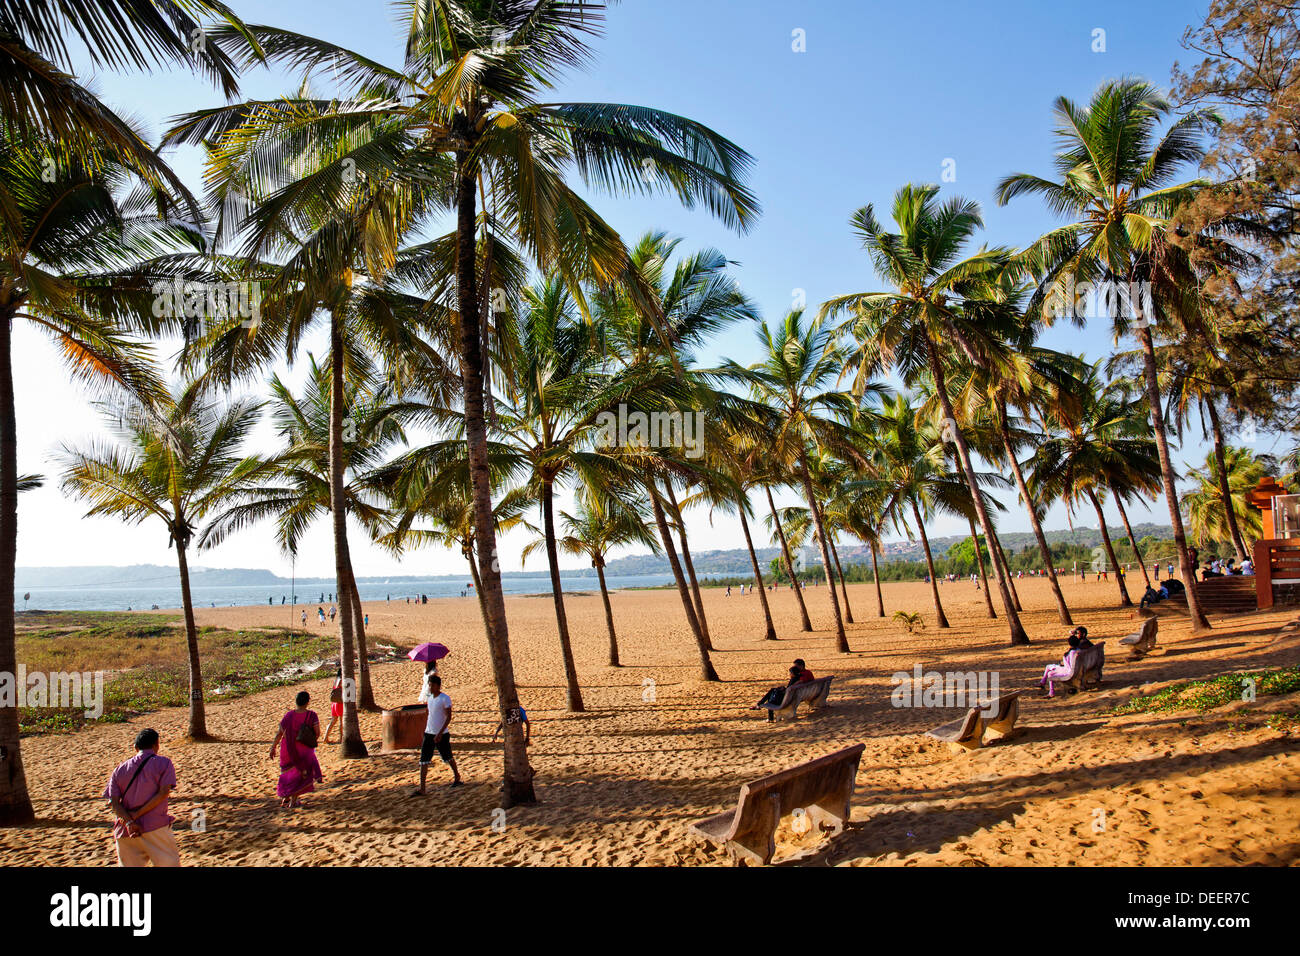 Tourists on the beach miramar beach panaji north goa for The miramar